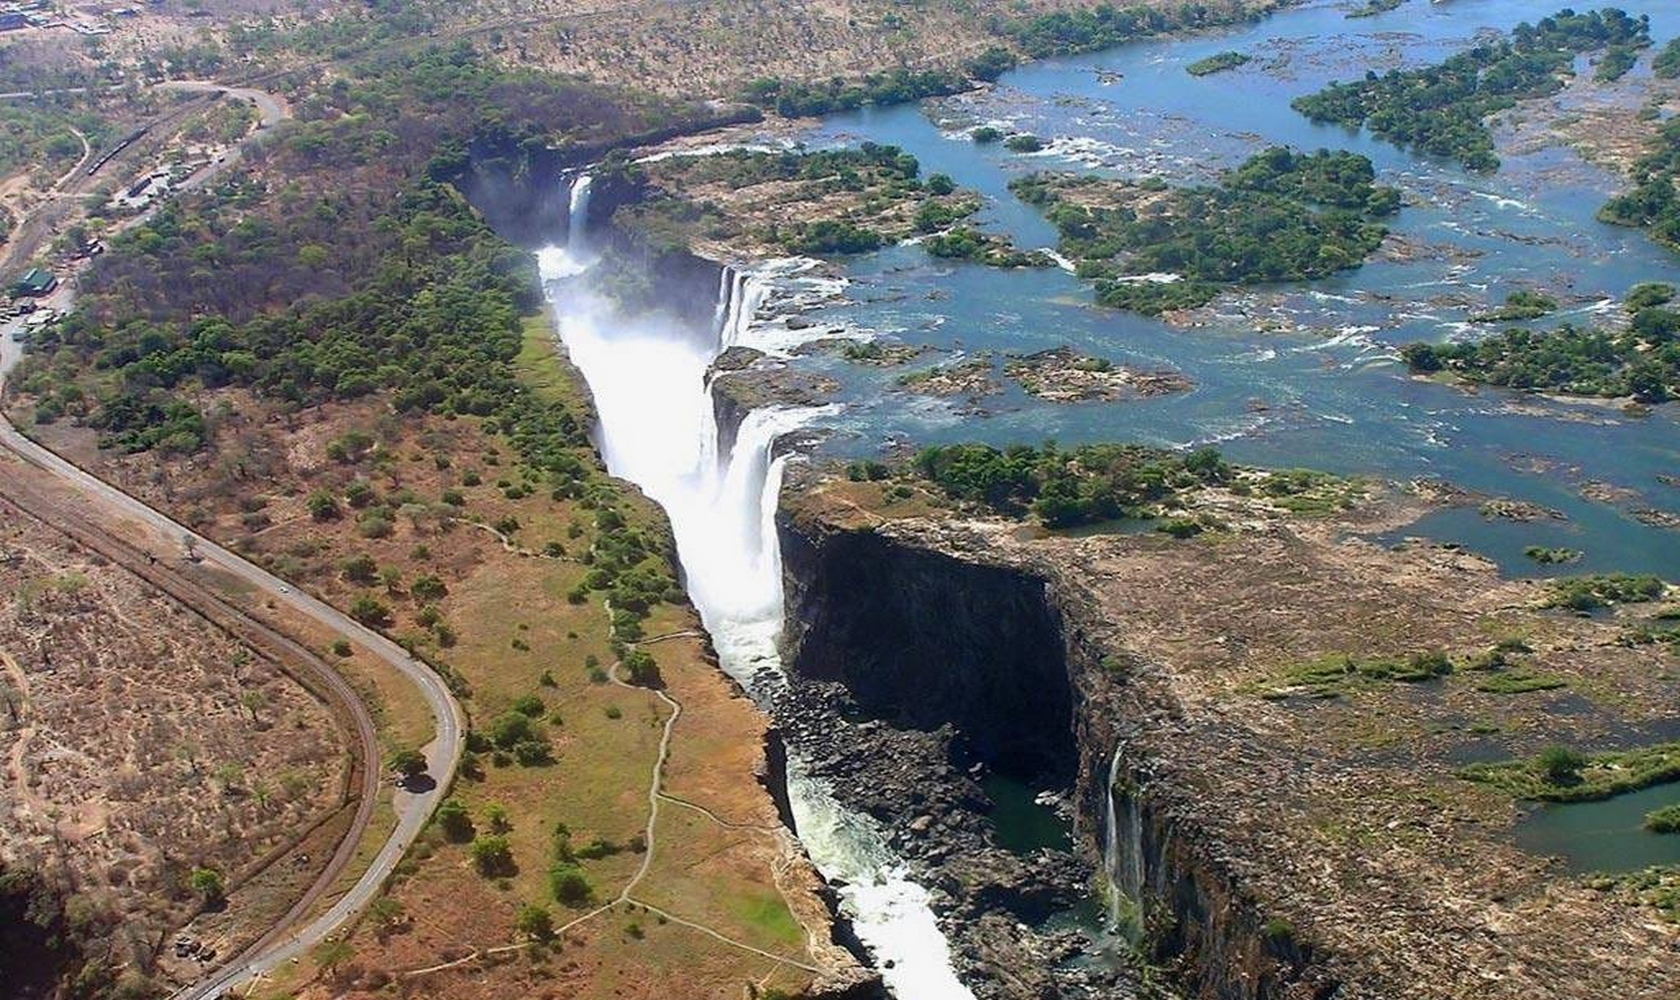 Africa_Chutes_Victoria_001-1680-1000.jpg